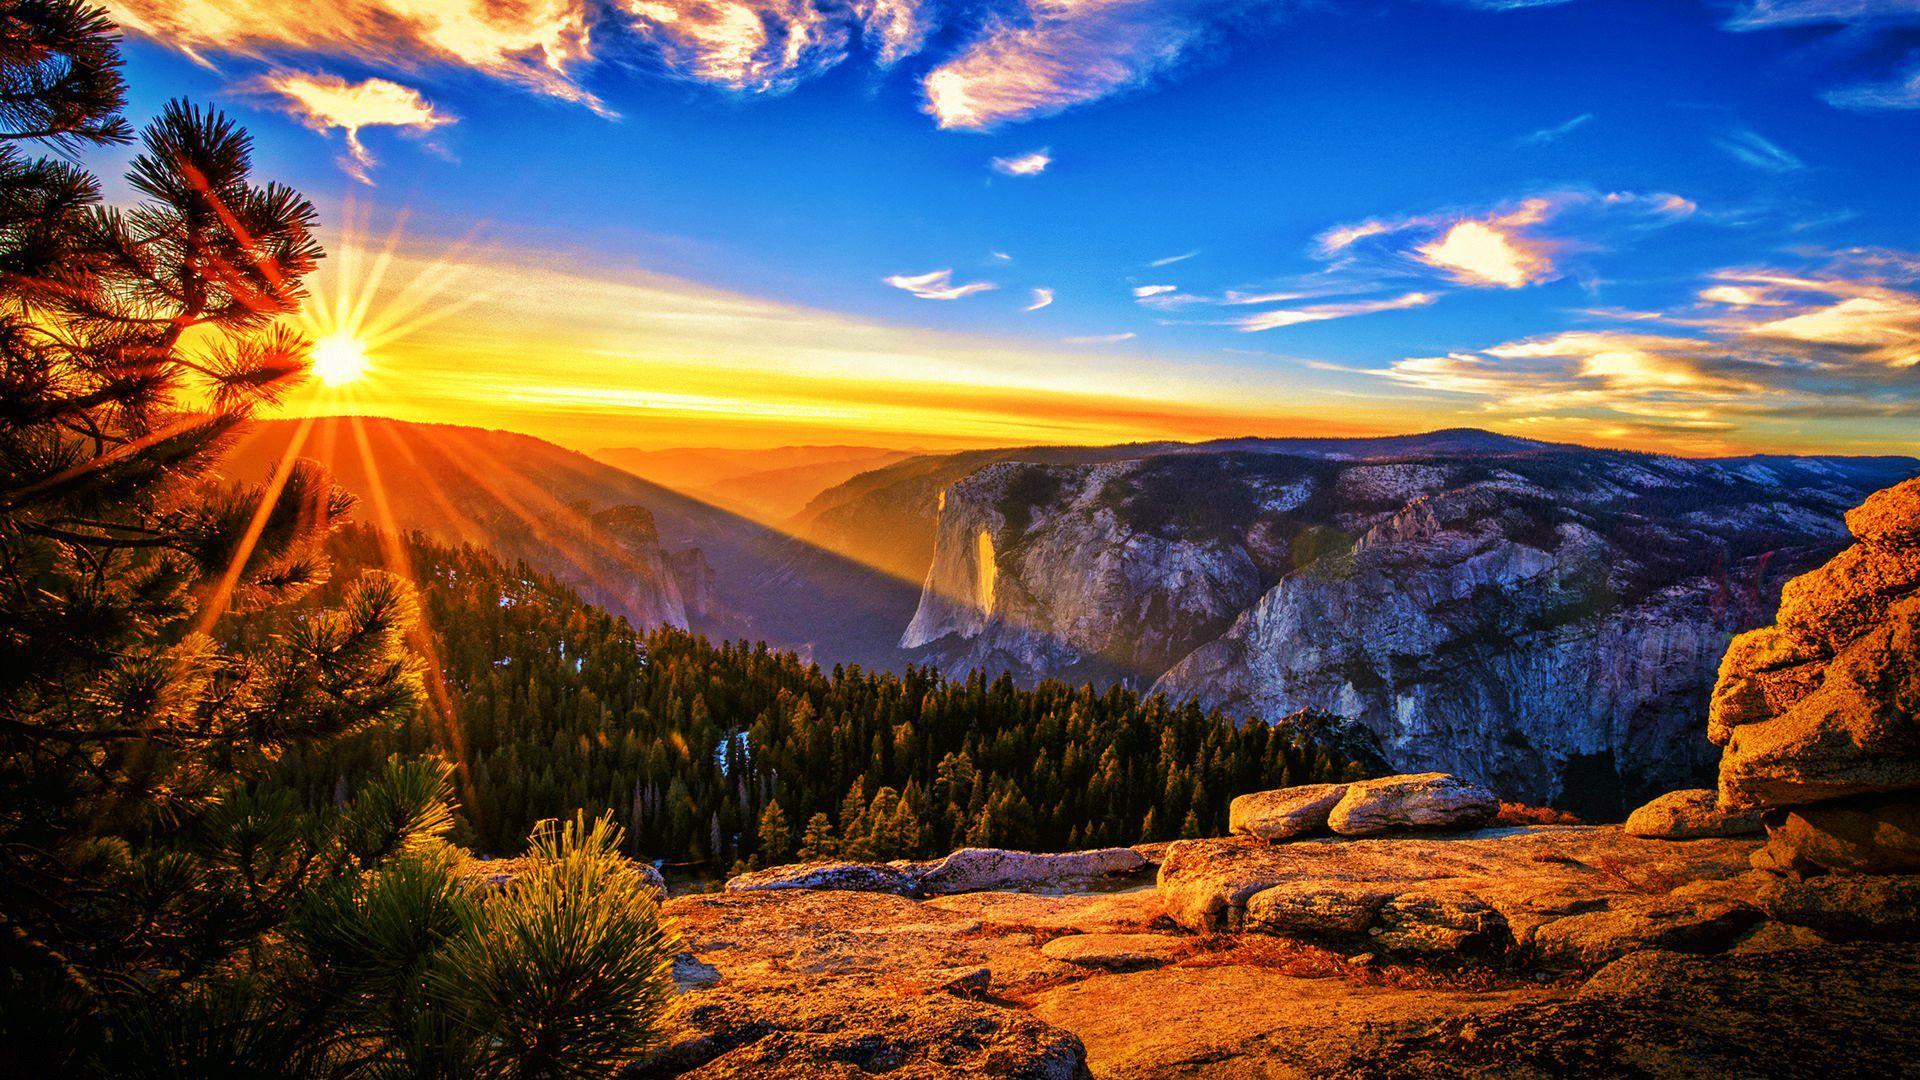 Good Wallpaper Mountain Sunrise - 2991e73d82734ed187a20998816e3968  Photograph_437366.jpg